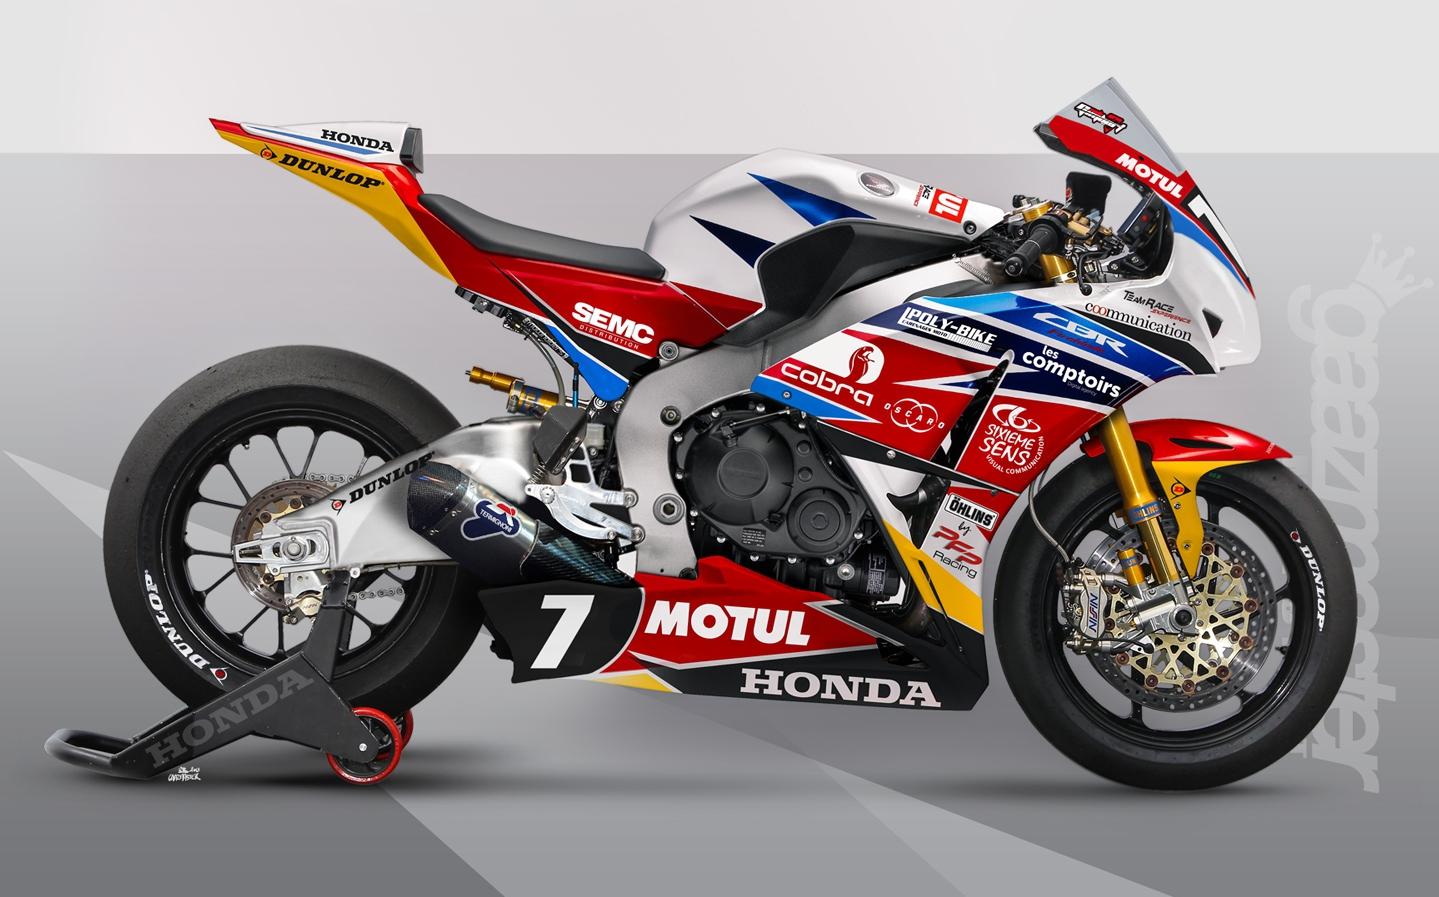 GaazMaster MotorSport Honda Racing SuperBike - 1439x897 - jpeg